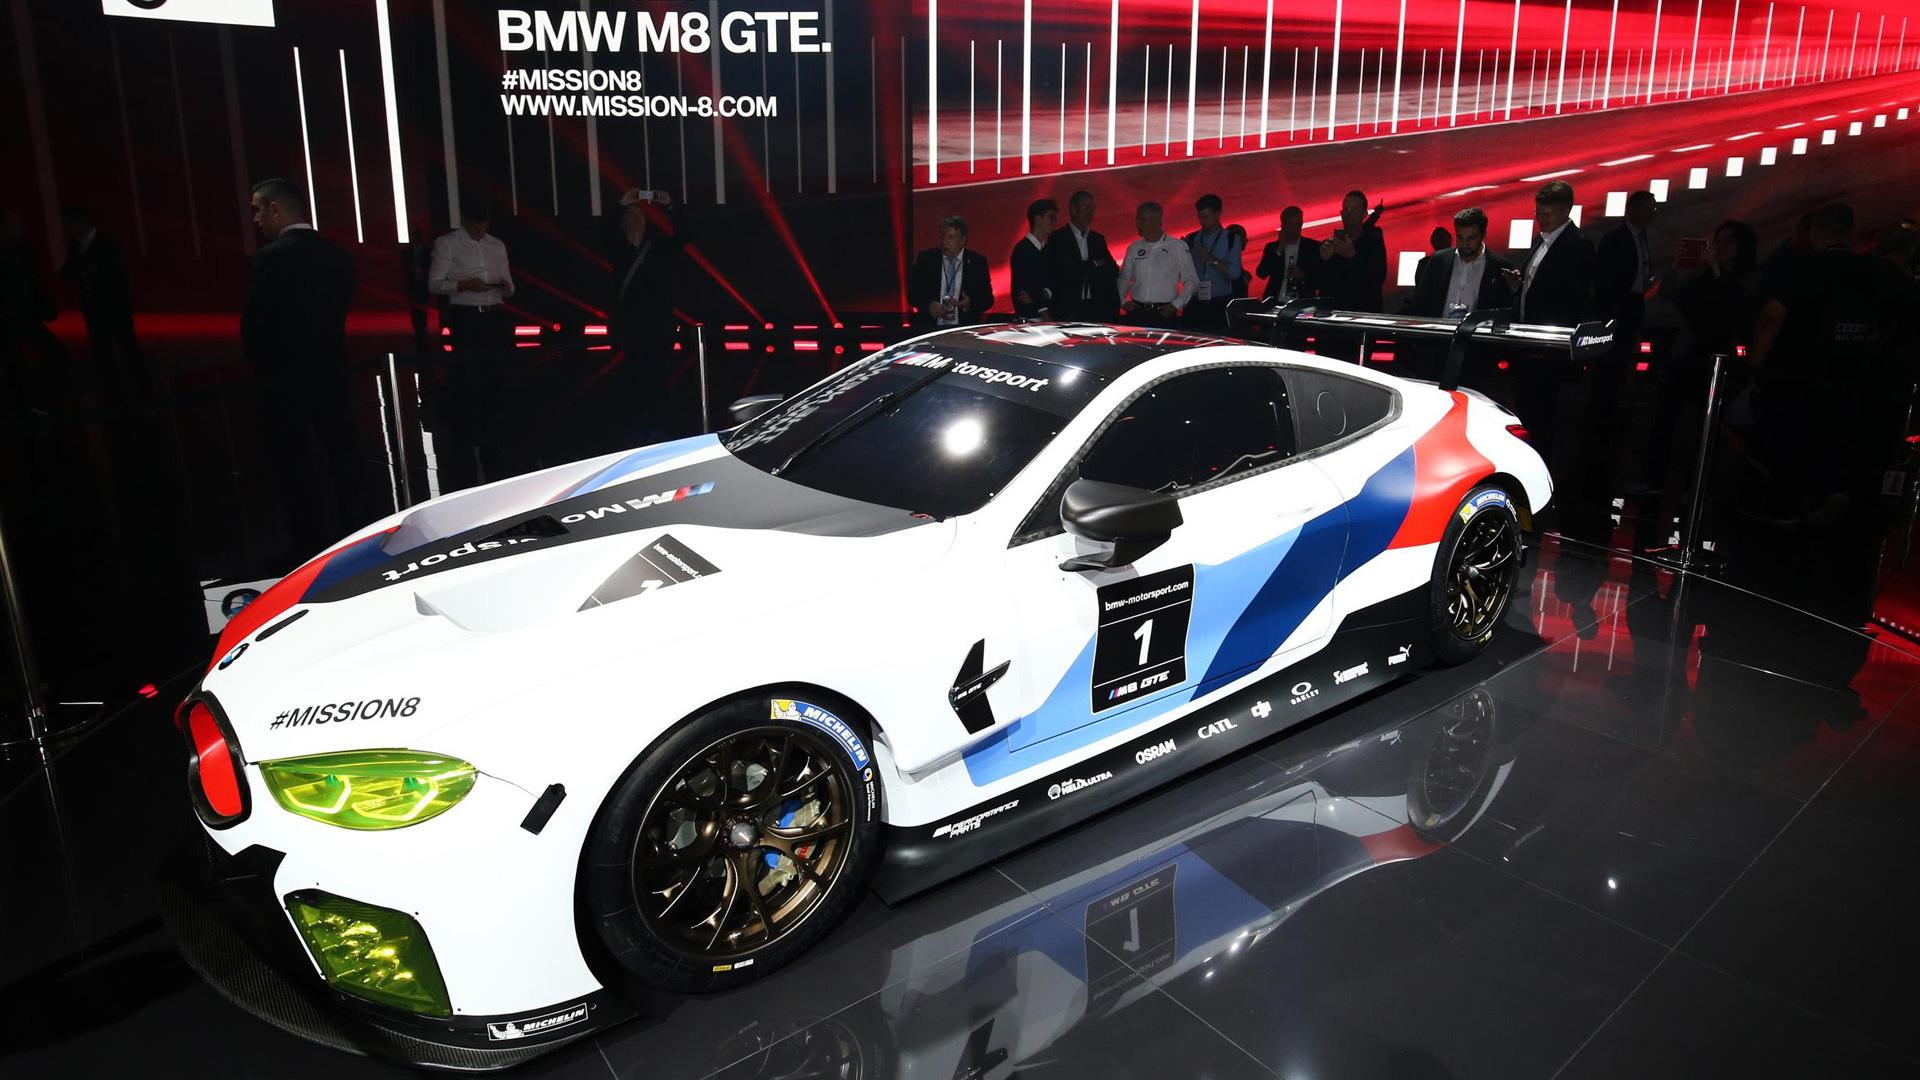 2018 BMW M8 GTE racecar, 2017 Frankfurt Motor Show